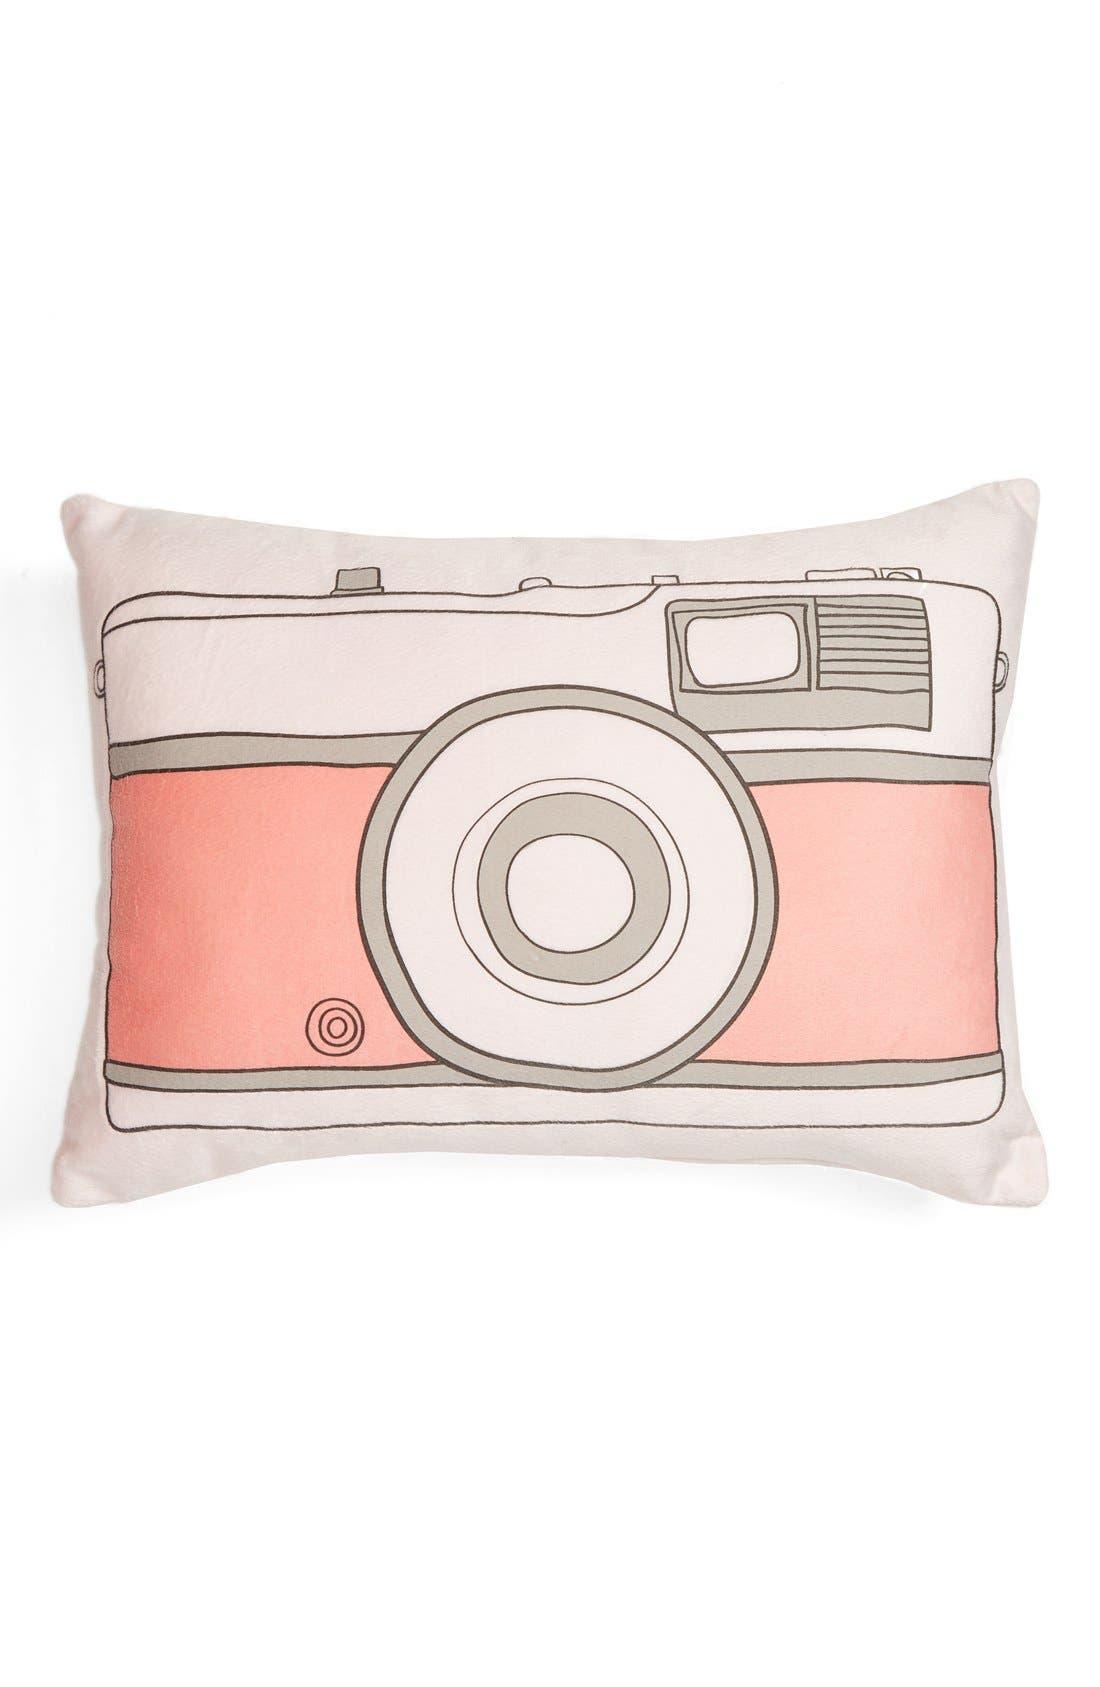 Capelli of New York Camera Pillow,                             Main thumbnail 1, color,                             690